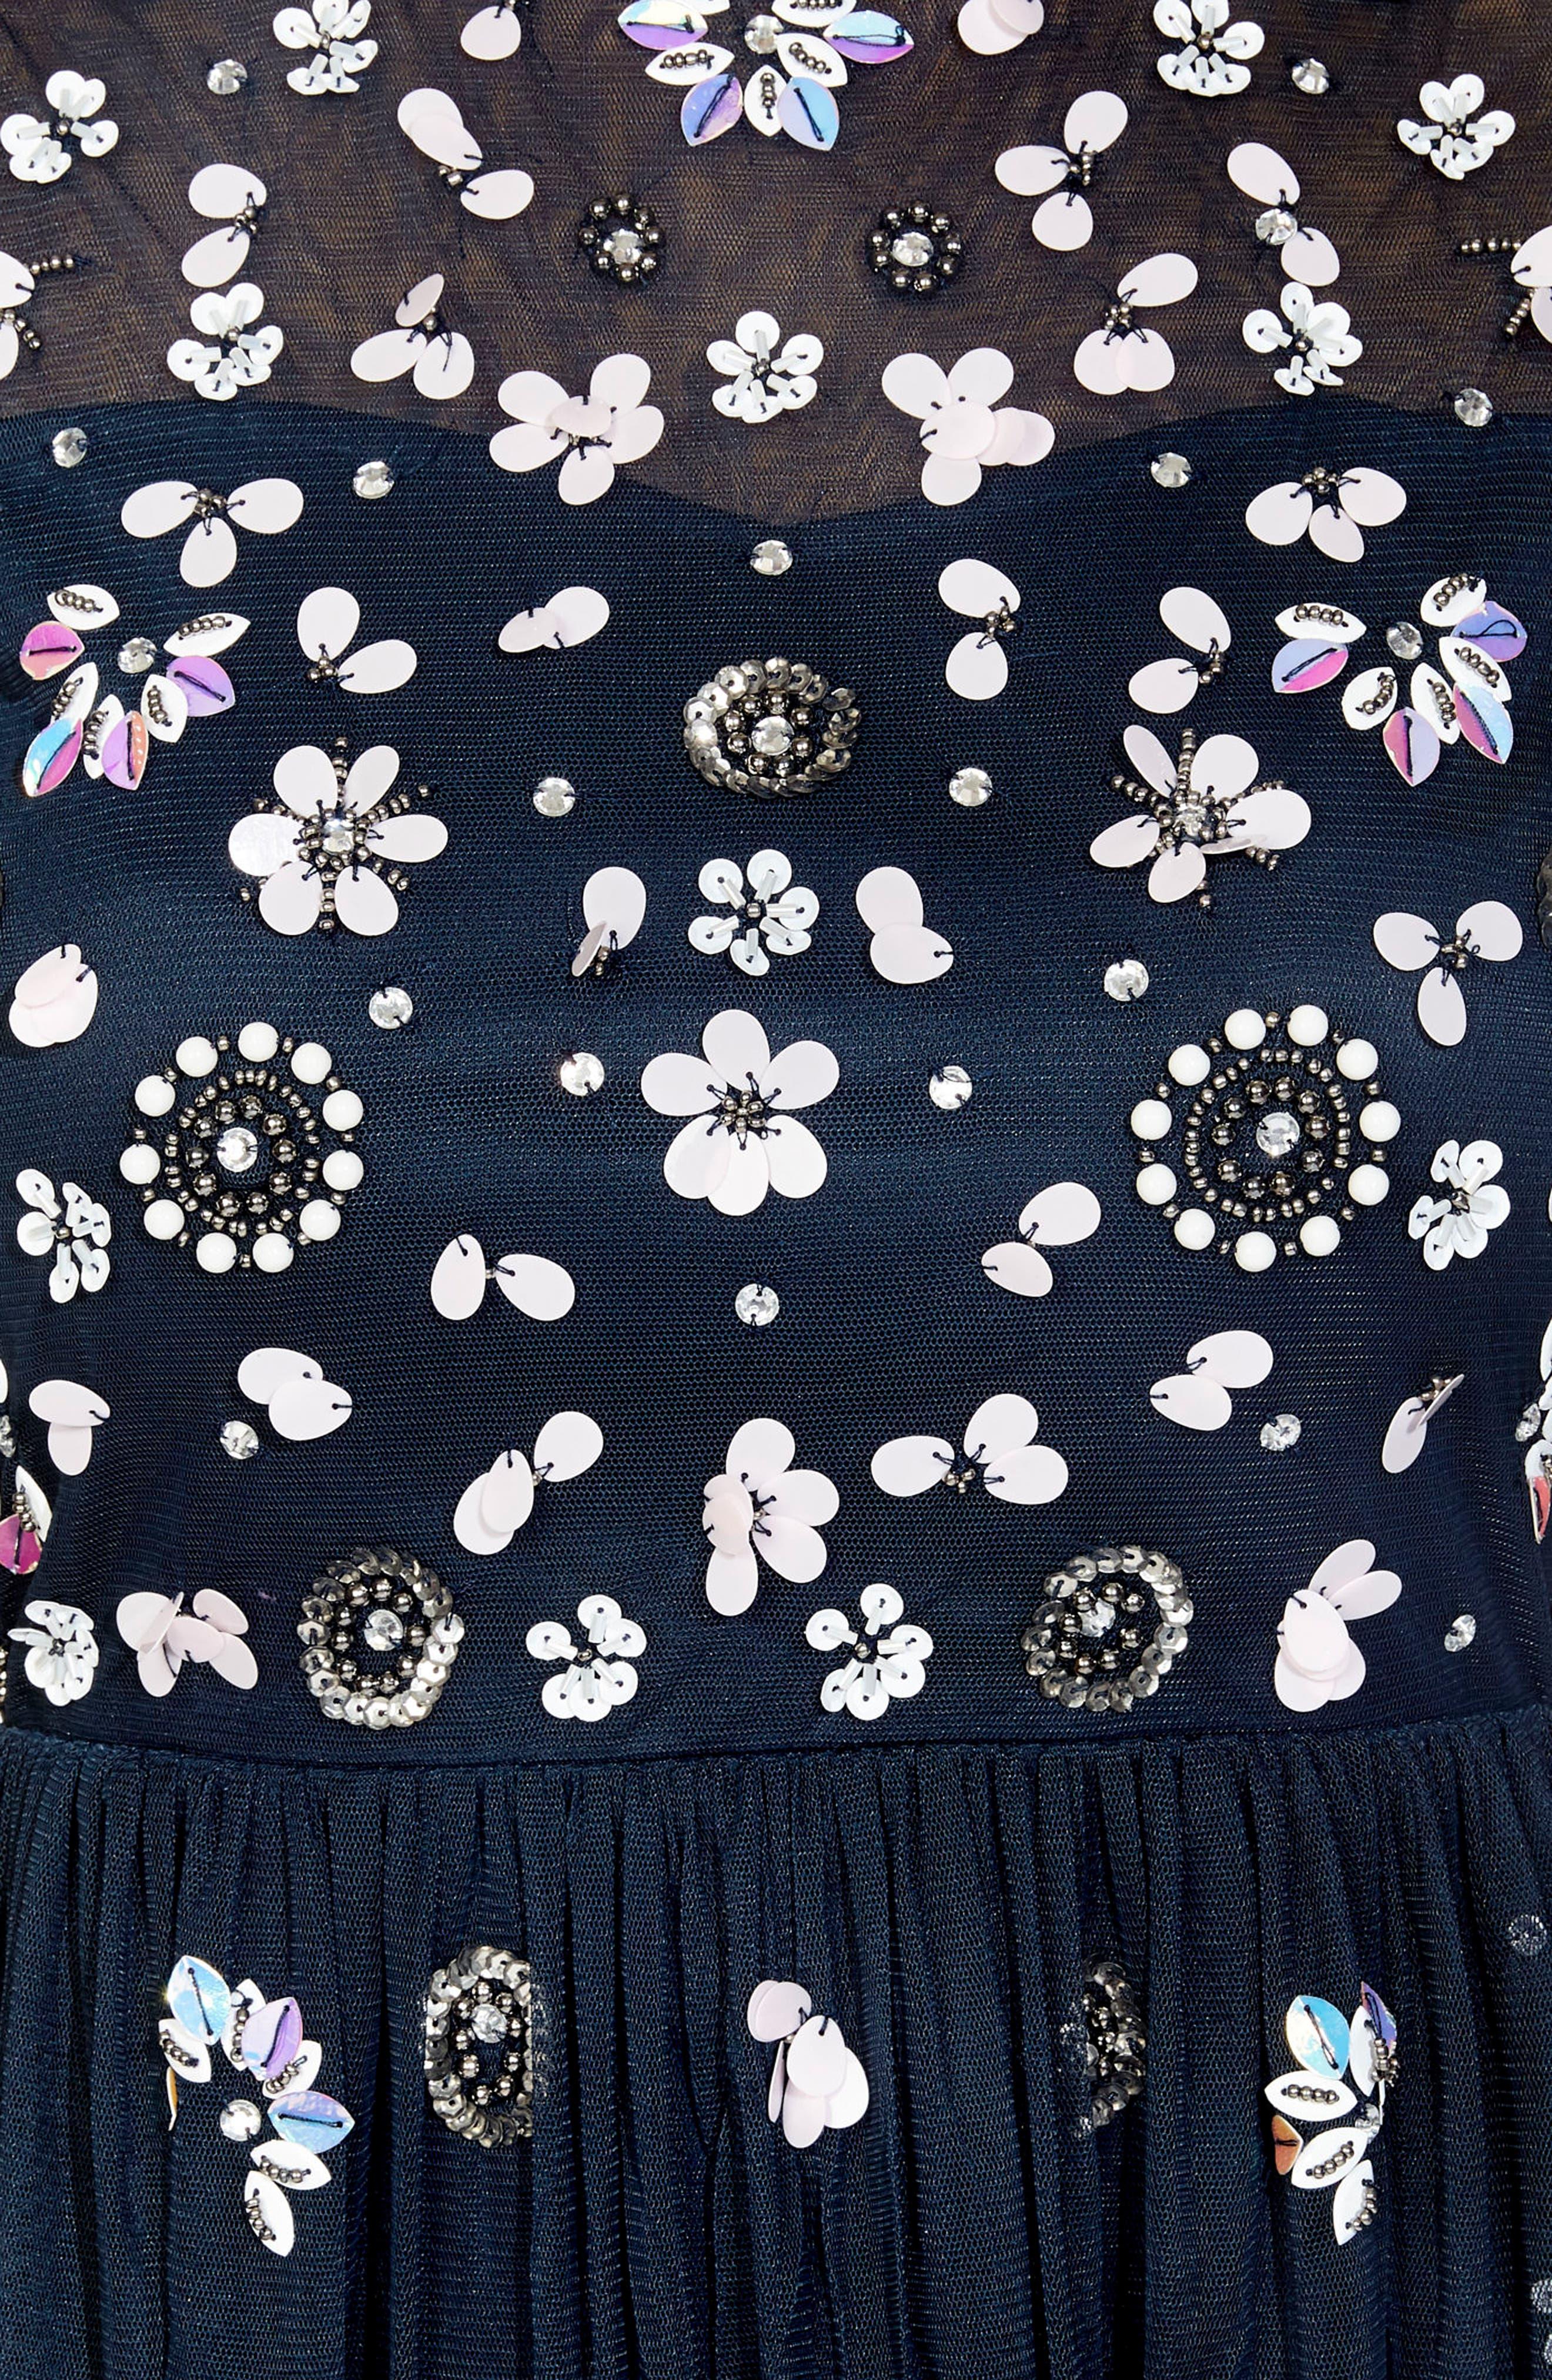 Baby Sequin Midi Dress,                             Alternate thumbnail 3, color,                             NAVY